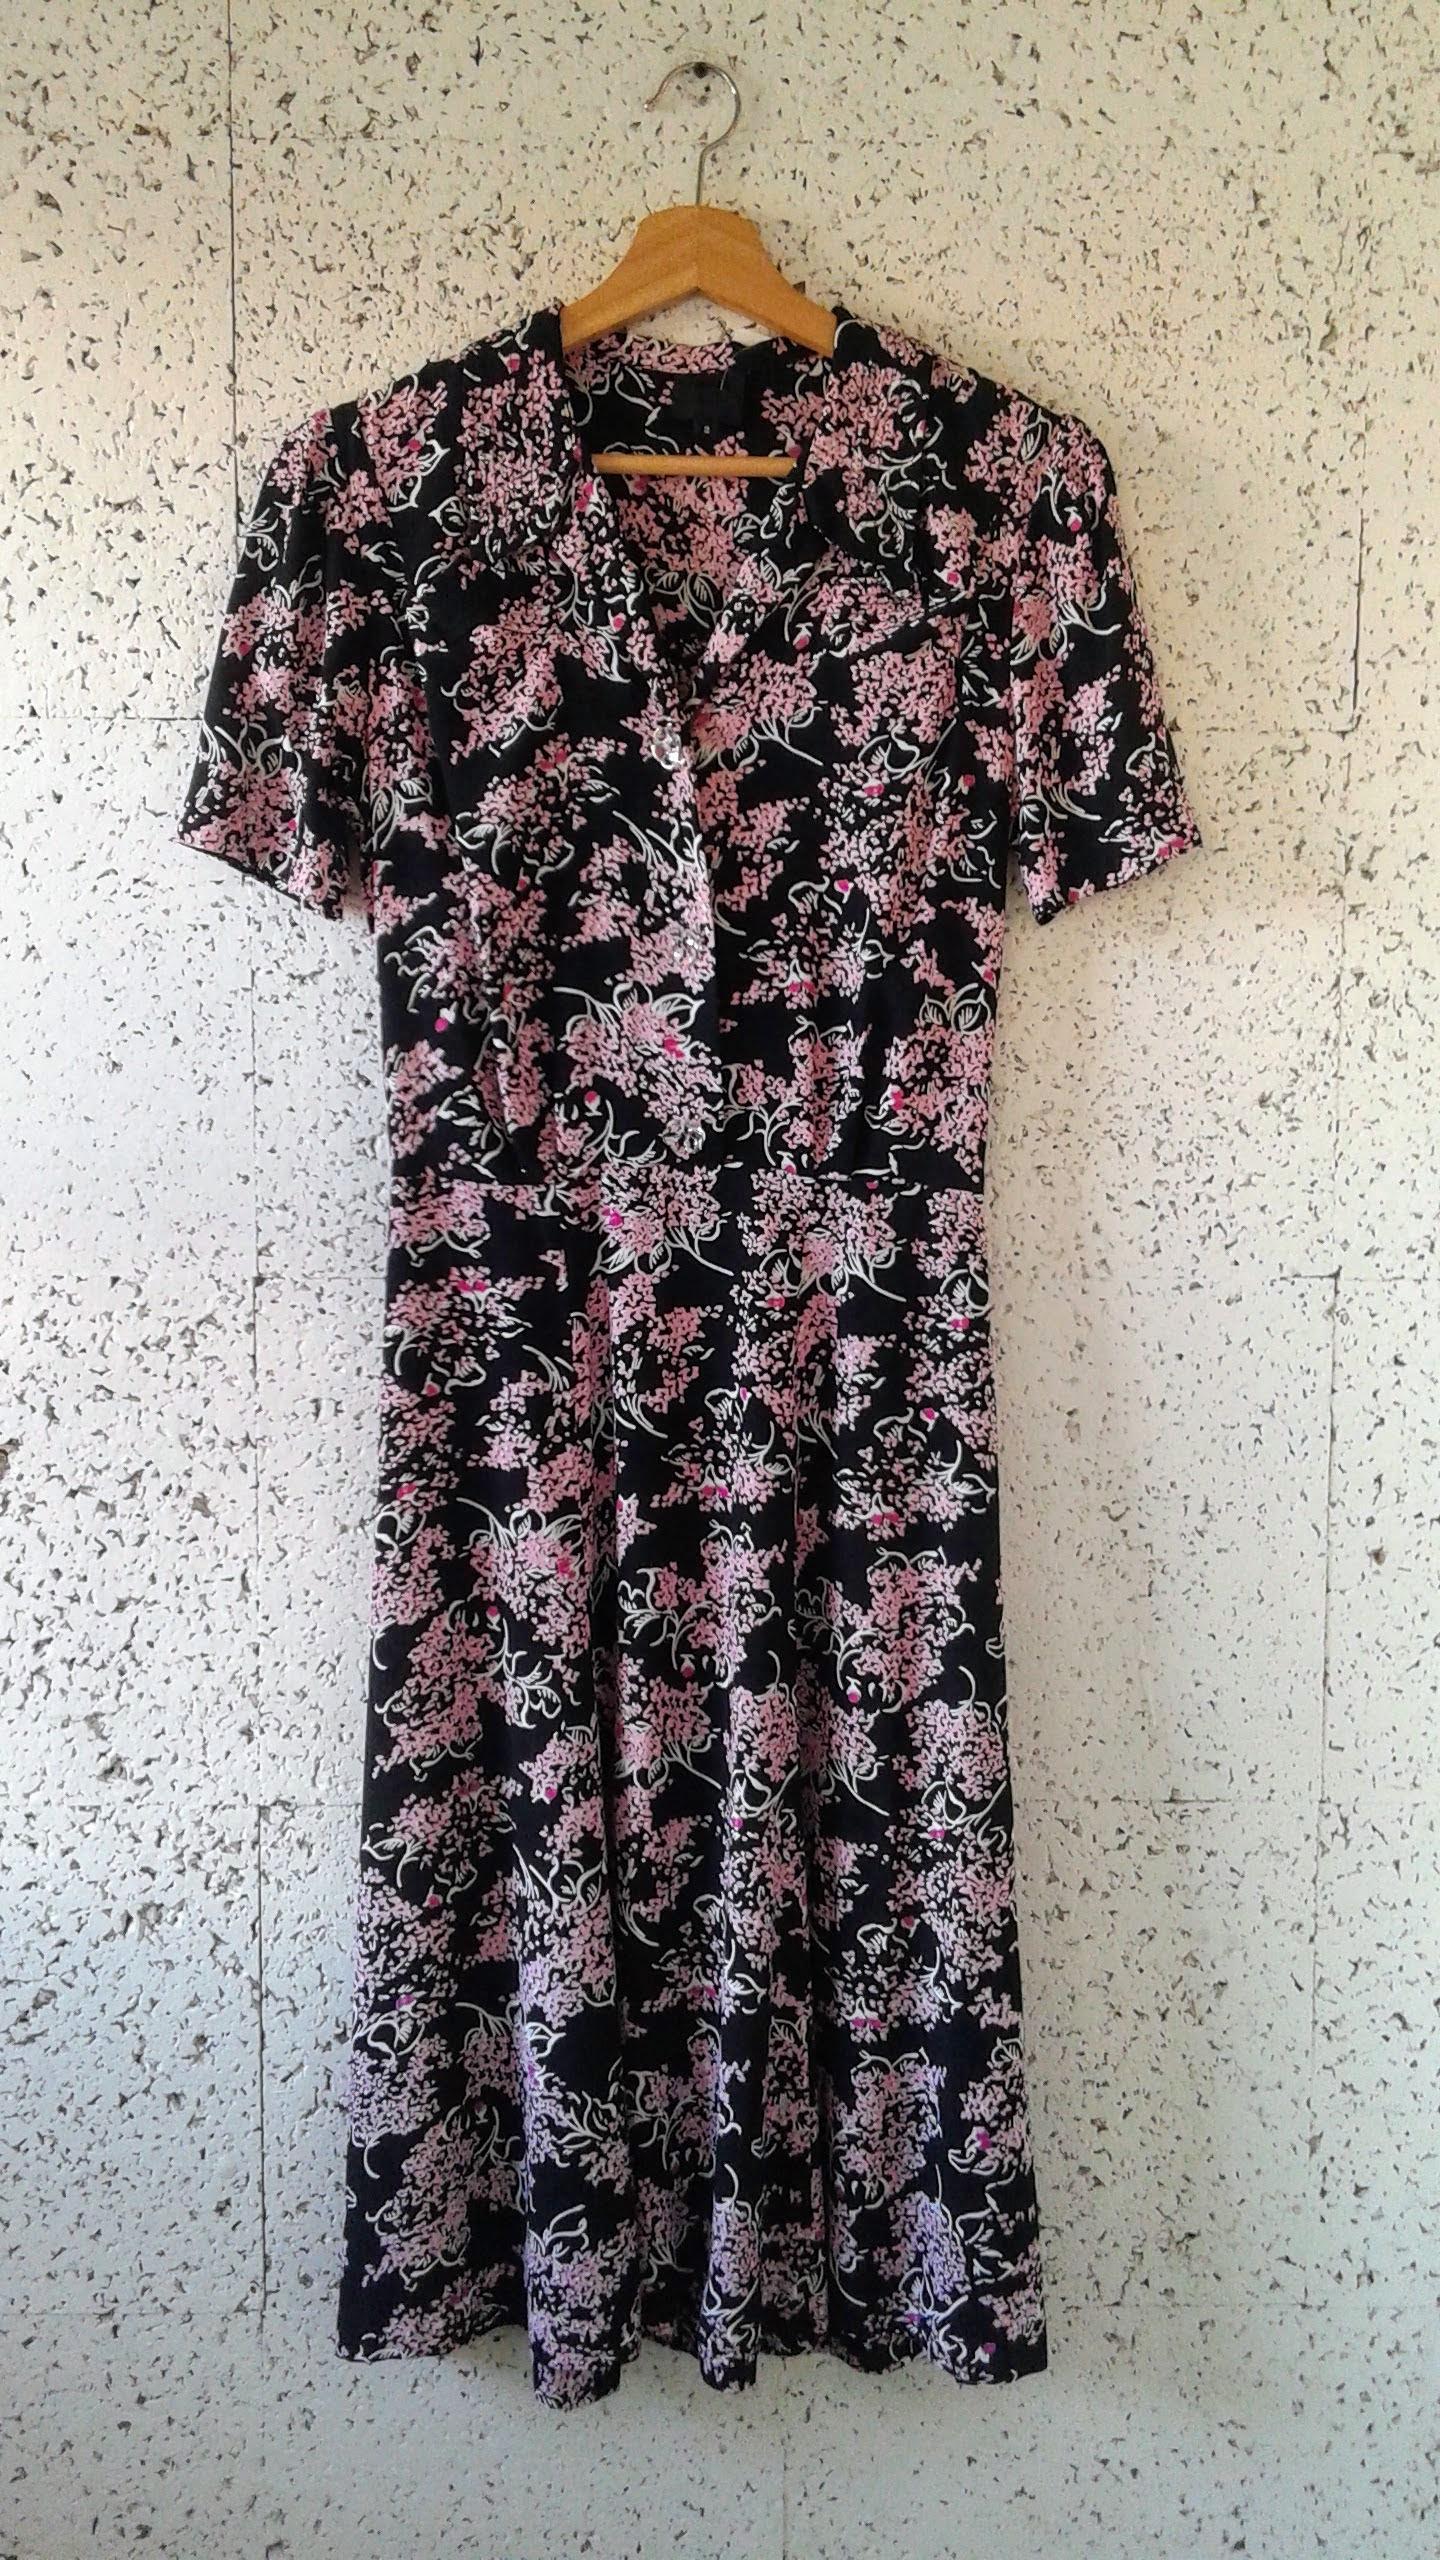 Anna Sui dress; Size S, $62